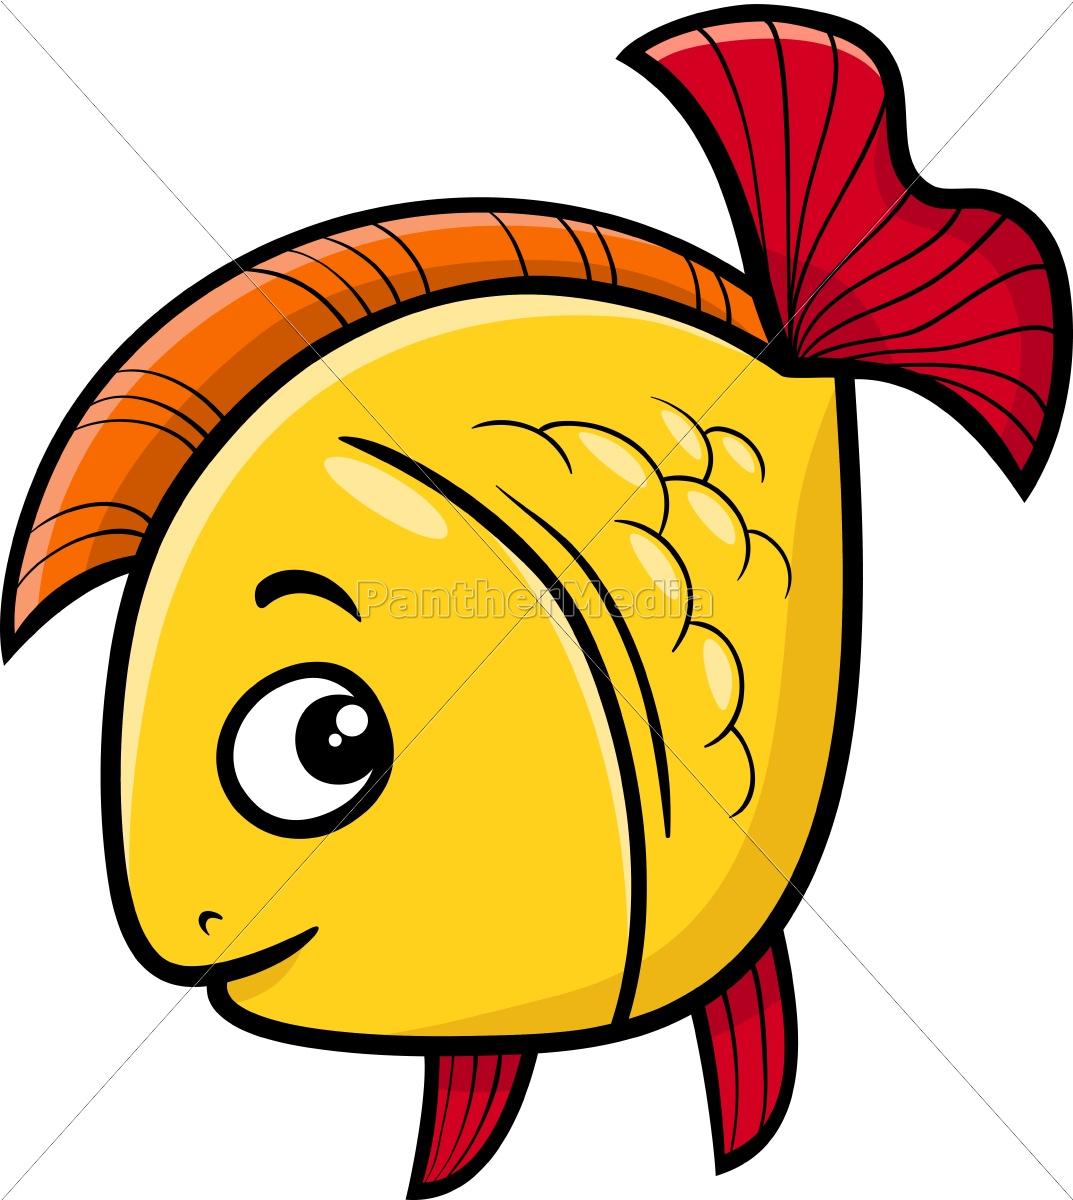 Lizenzfreie Vektorgrafik 14565779 - Goldener Fisch Cartoon Abbildung innen Fische Comic